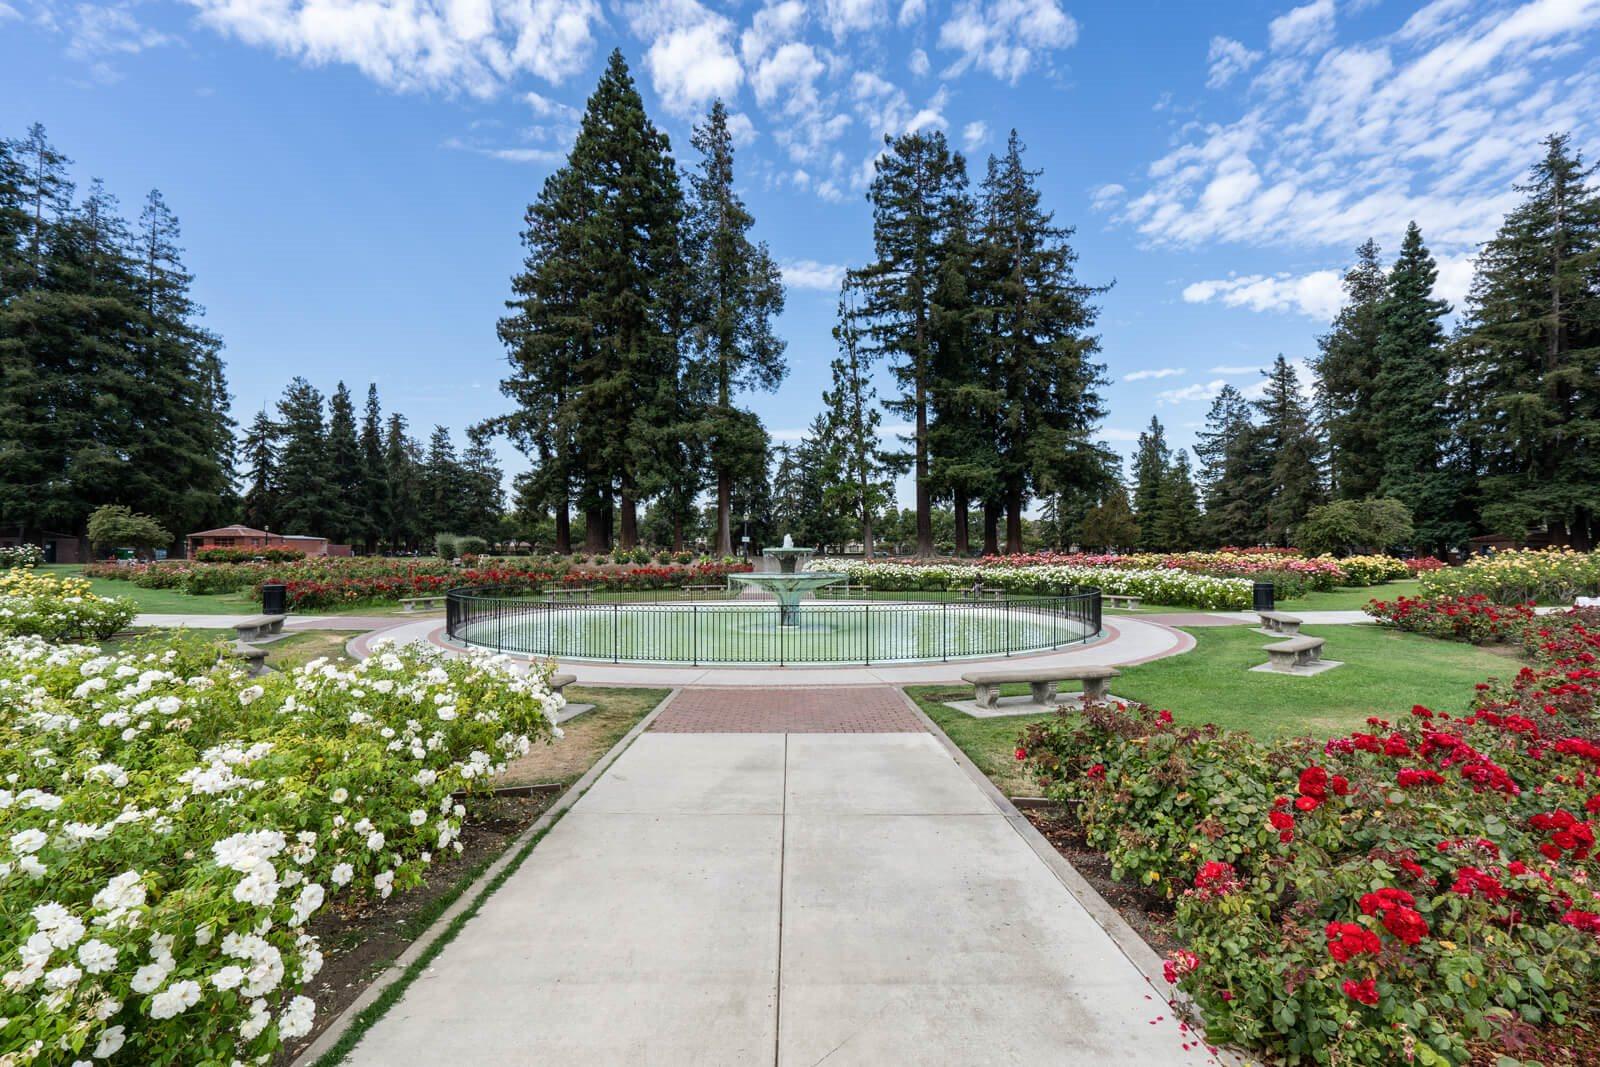 San Jose Municipal Rose Garden near Pavona Apartments, California, 95112